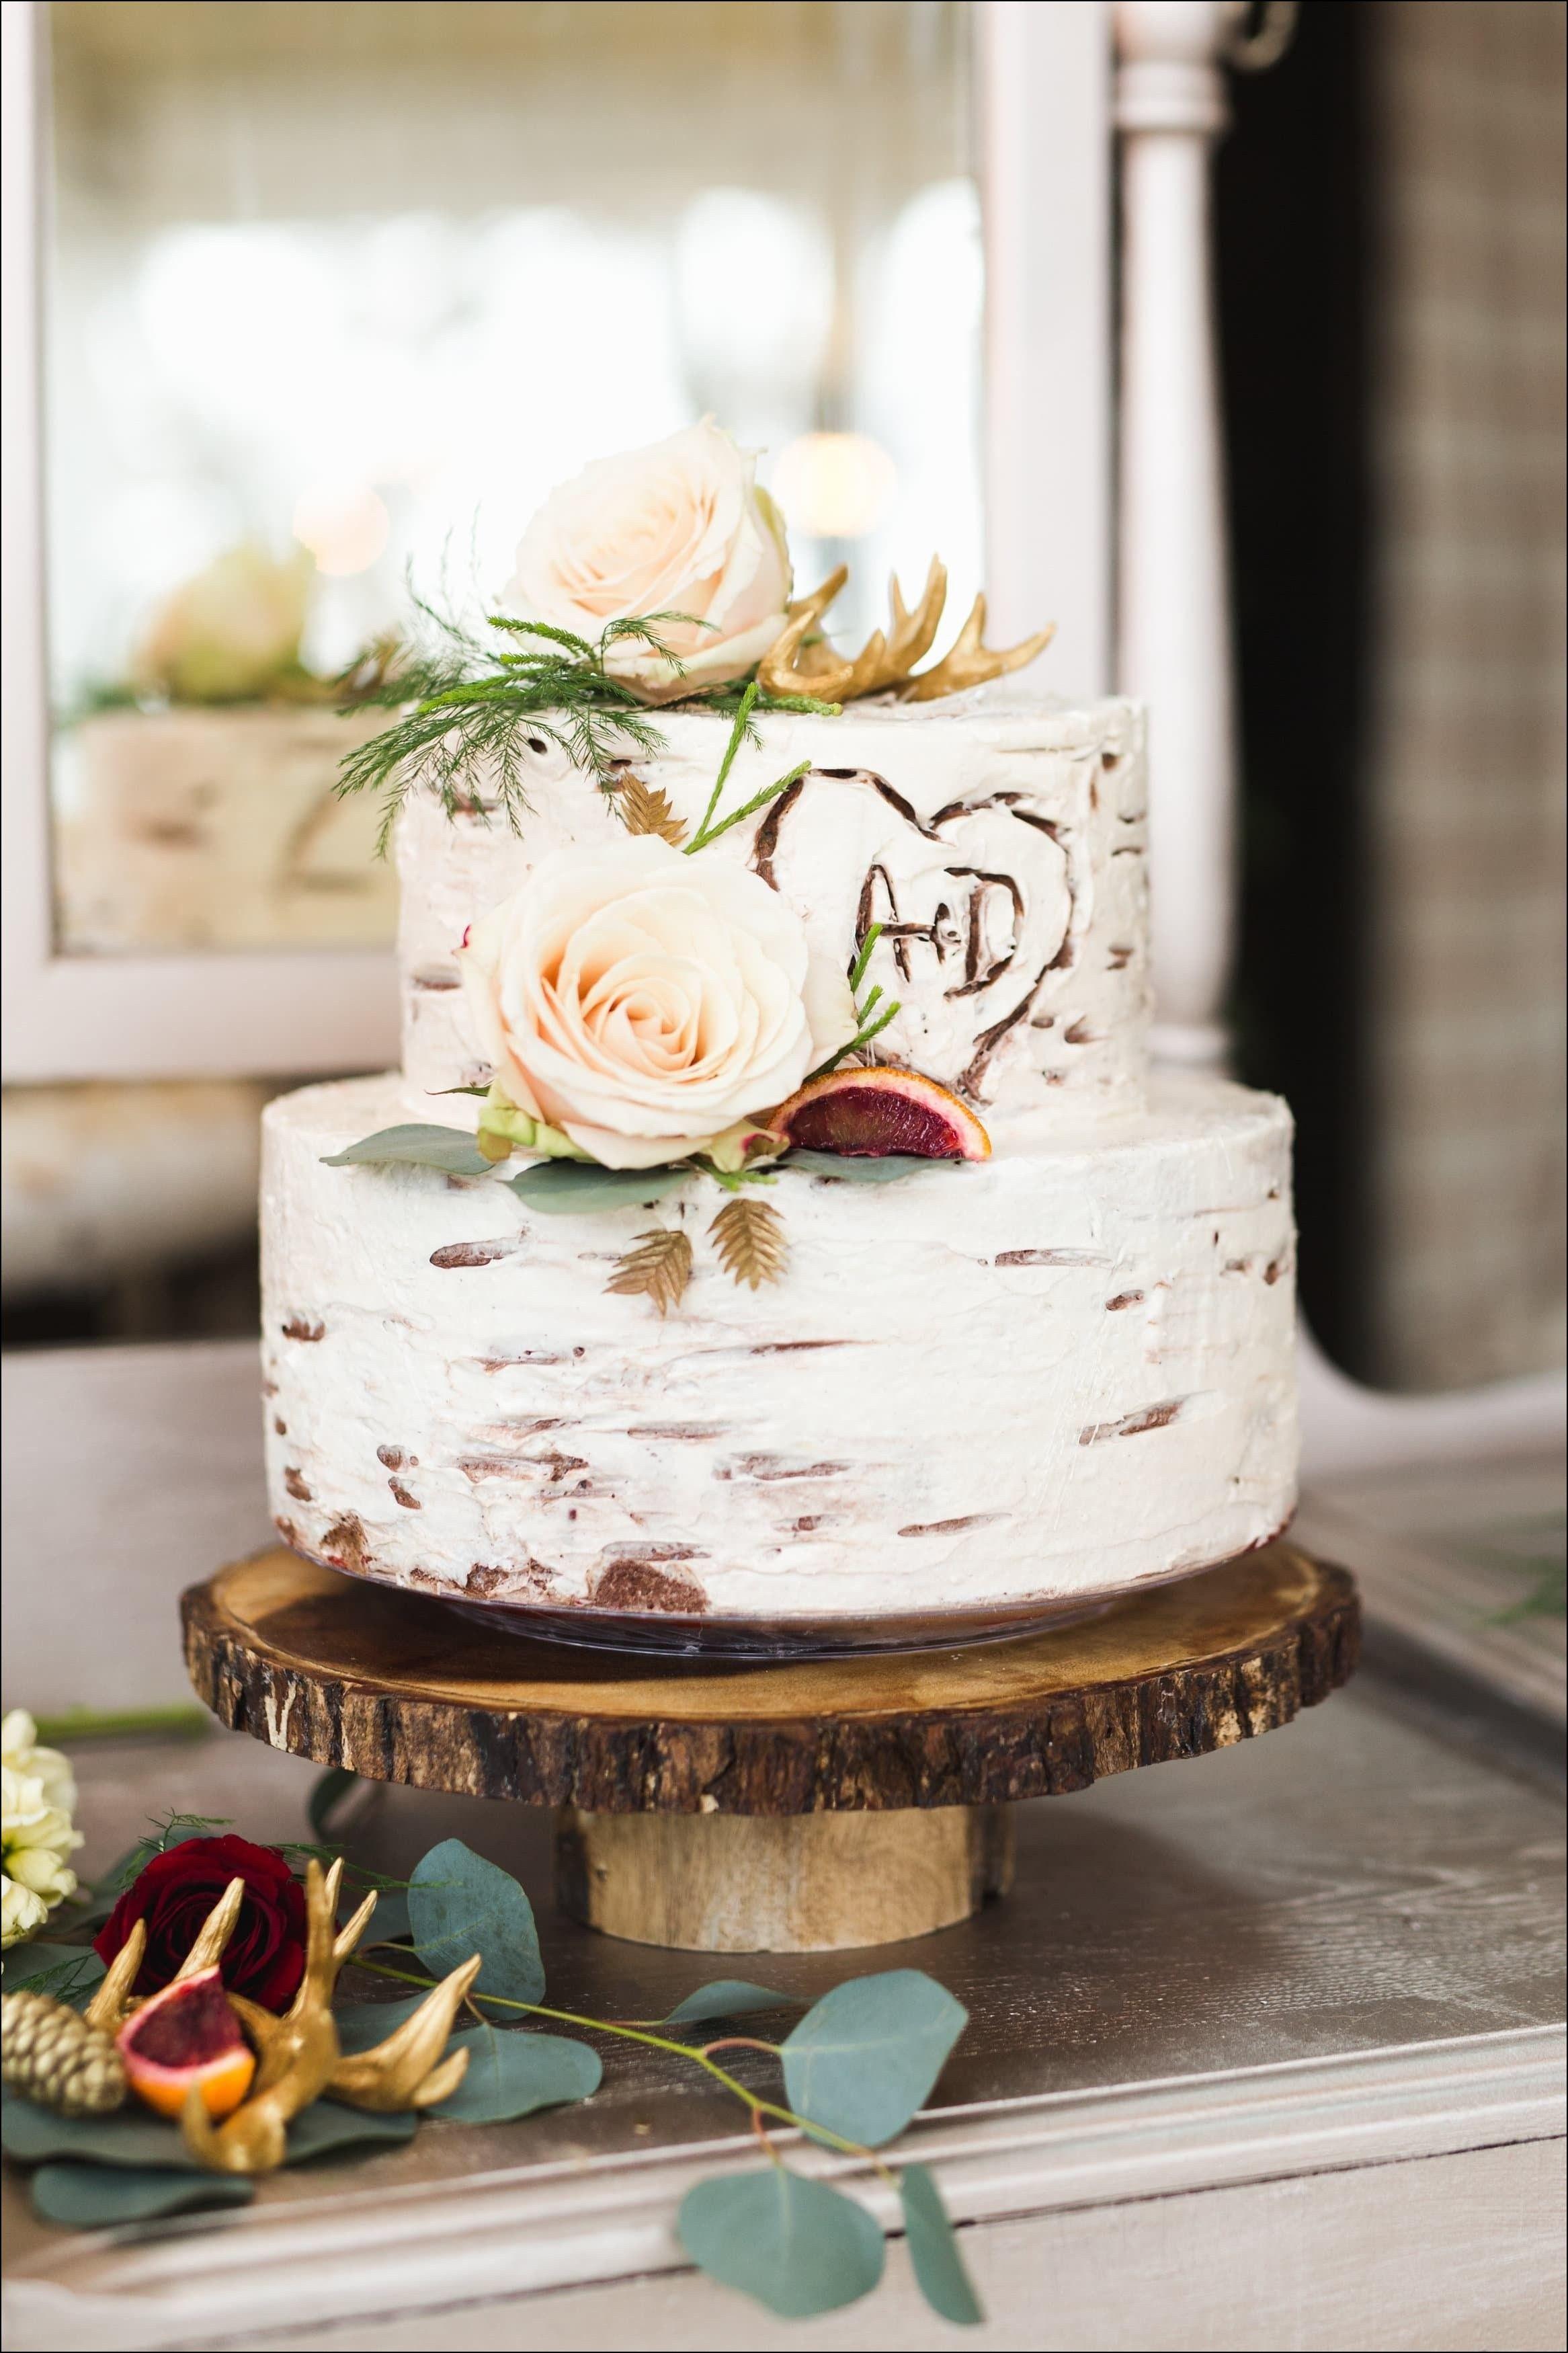 Wedding decorations barn  Barn themed Wedding Cakes  Wedding Ideas  Pinterest  Themed